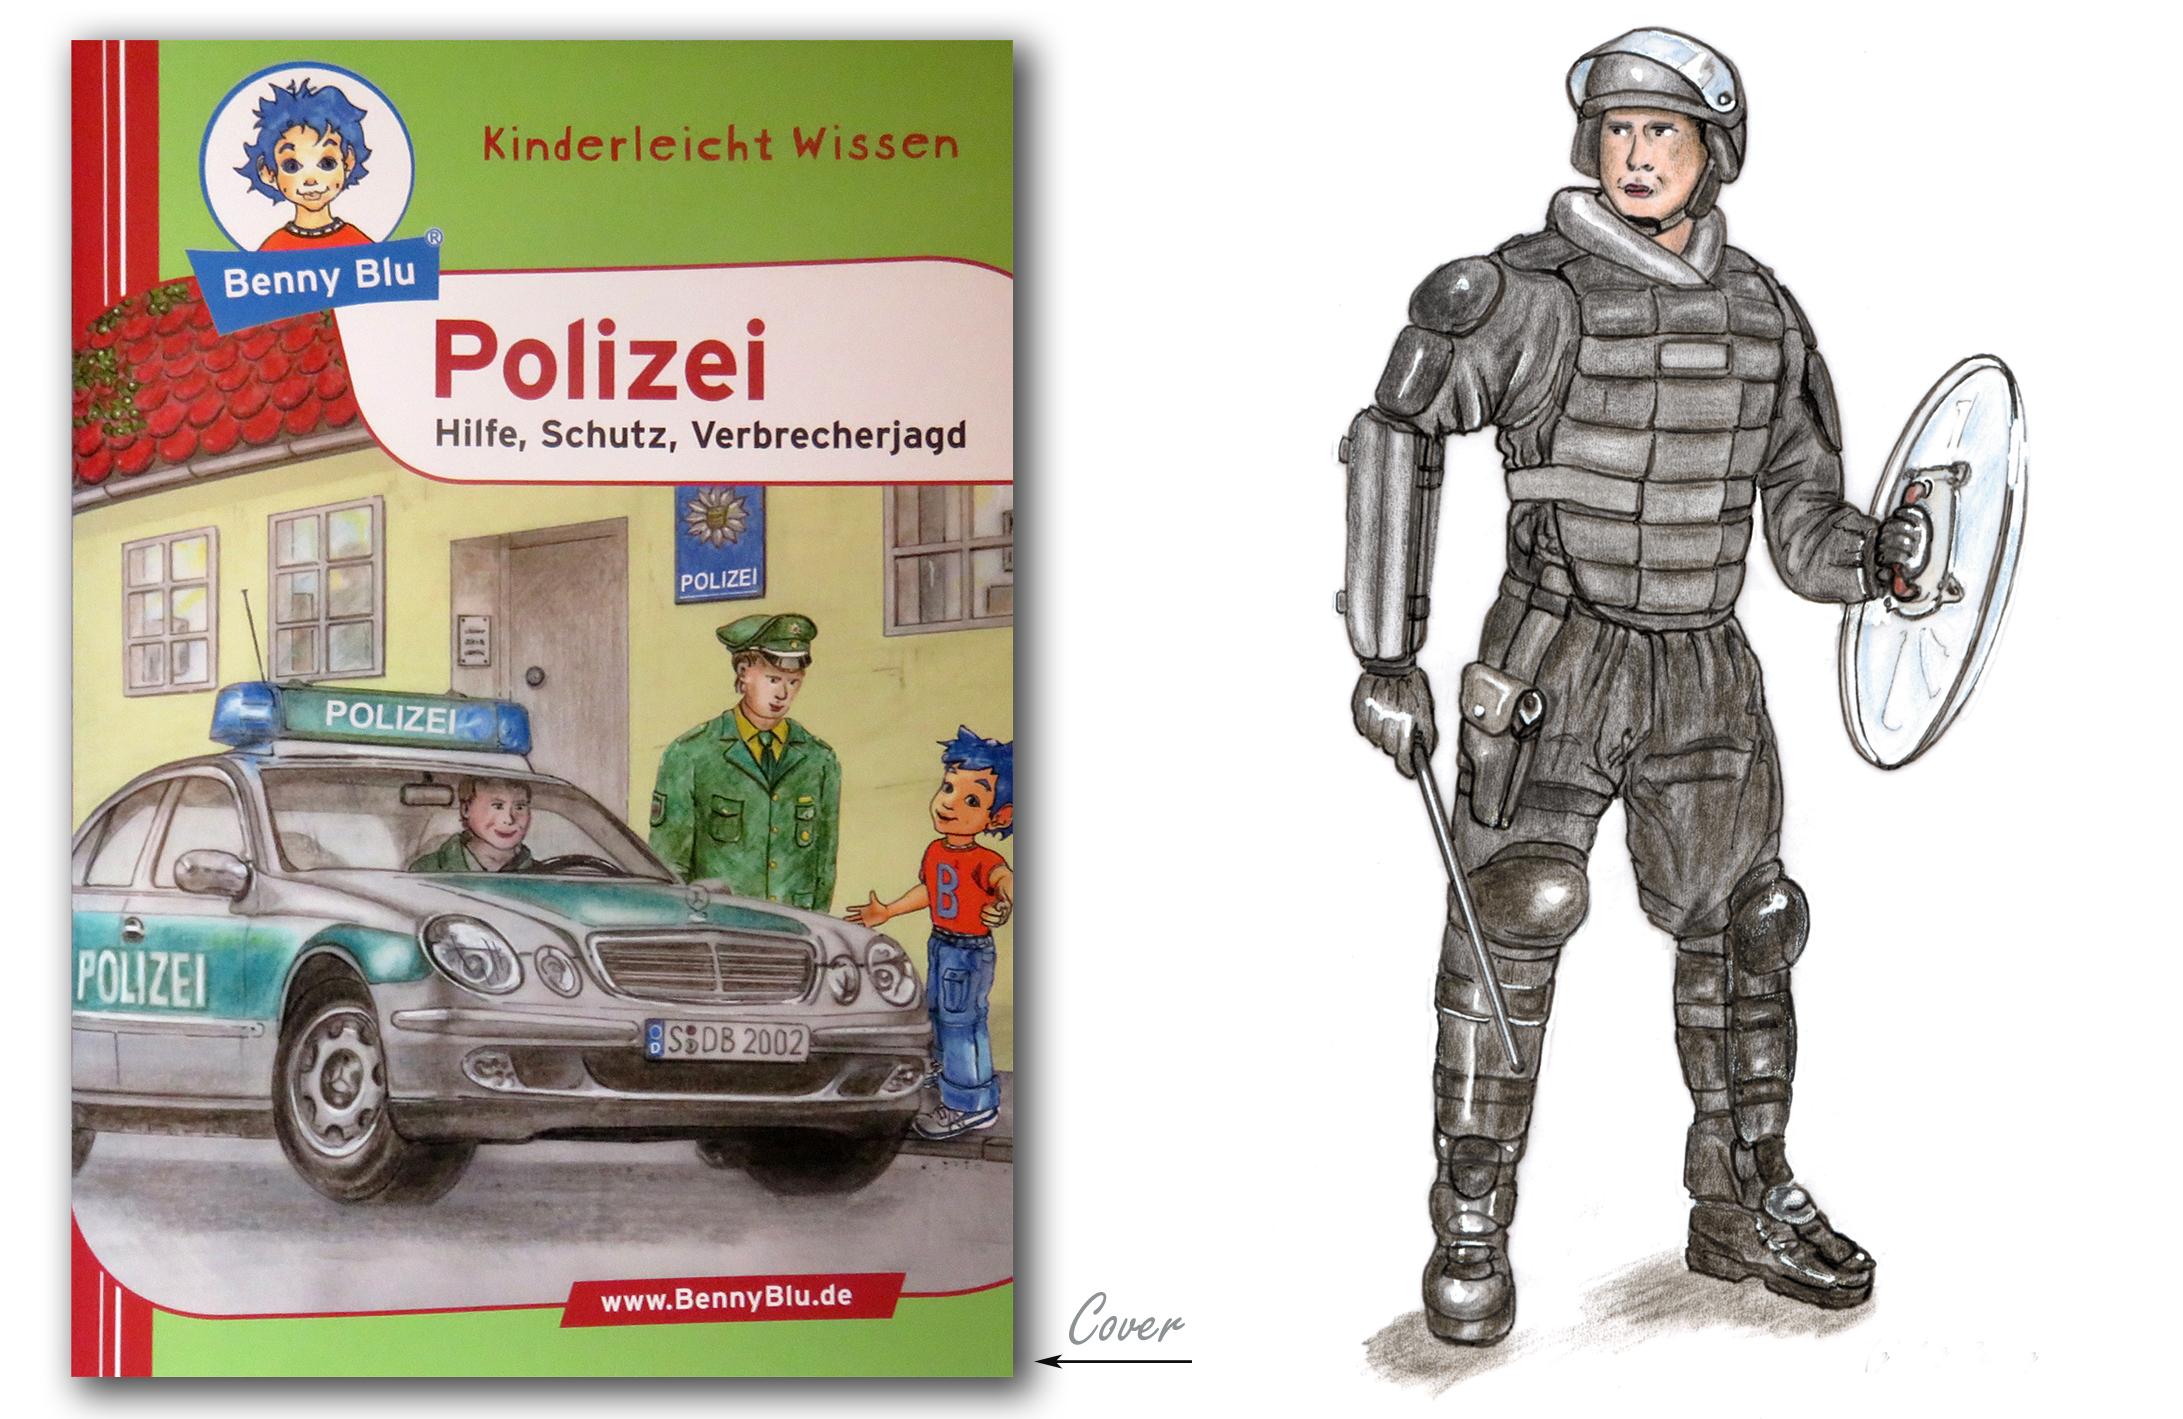 Polizei Kinderheft